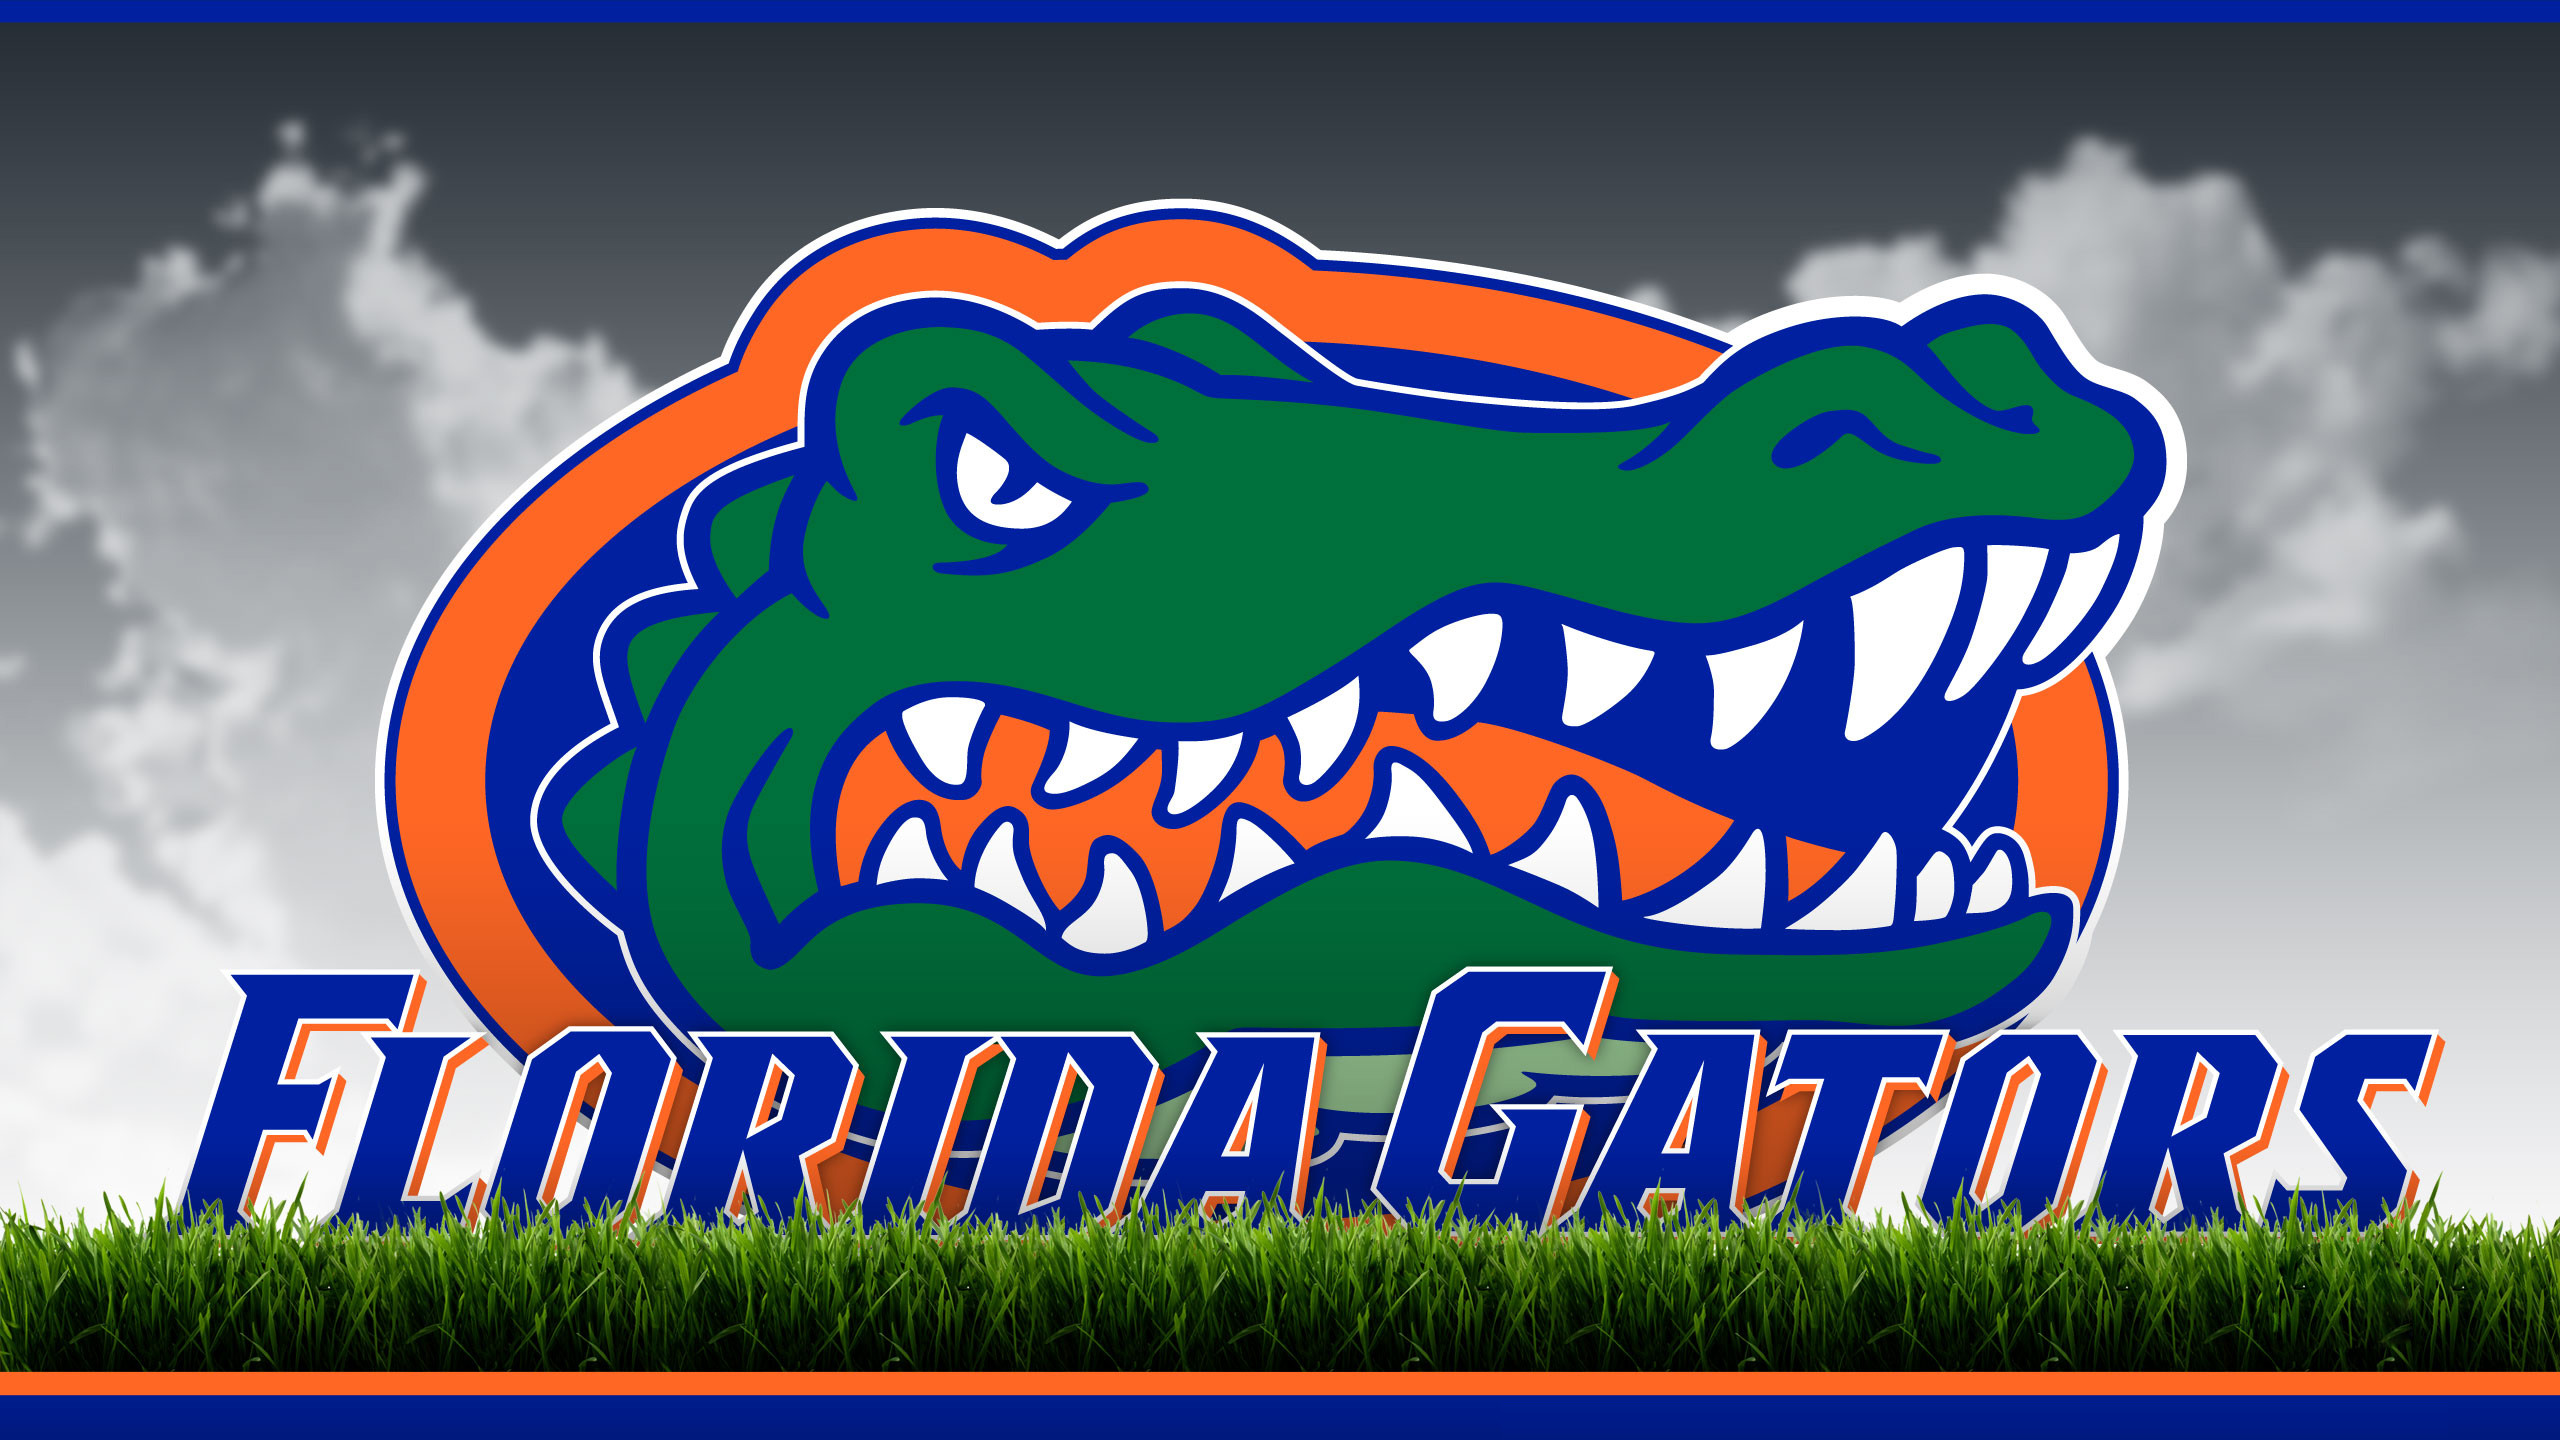 wallpaper.wiki-Florida-Gators-Images-PIC-WPD006739